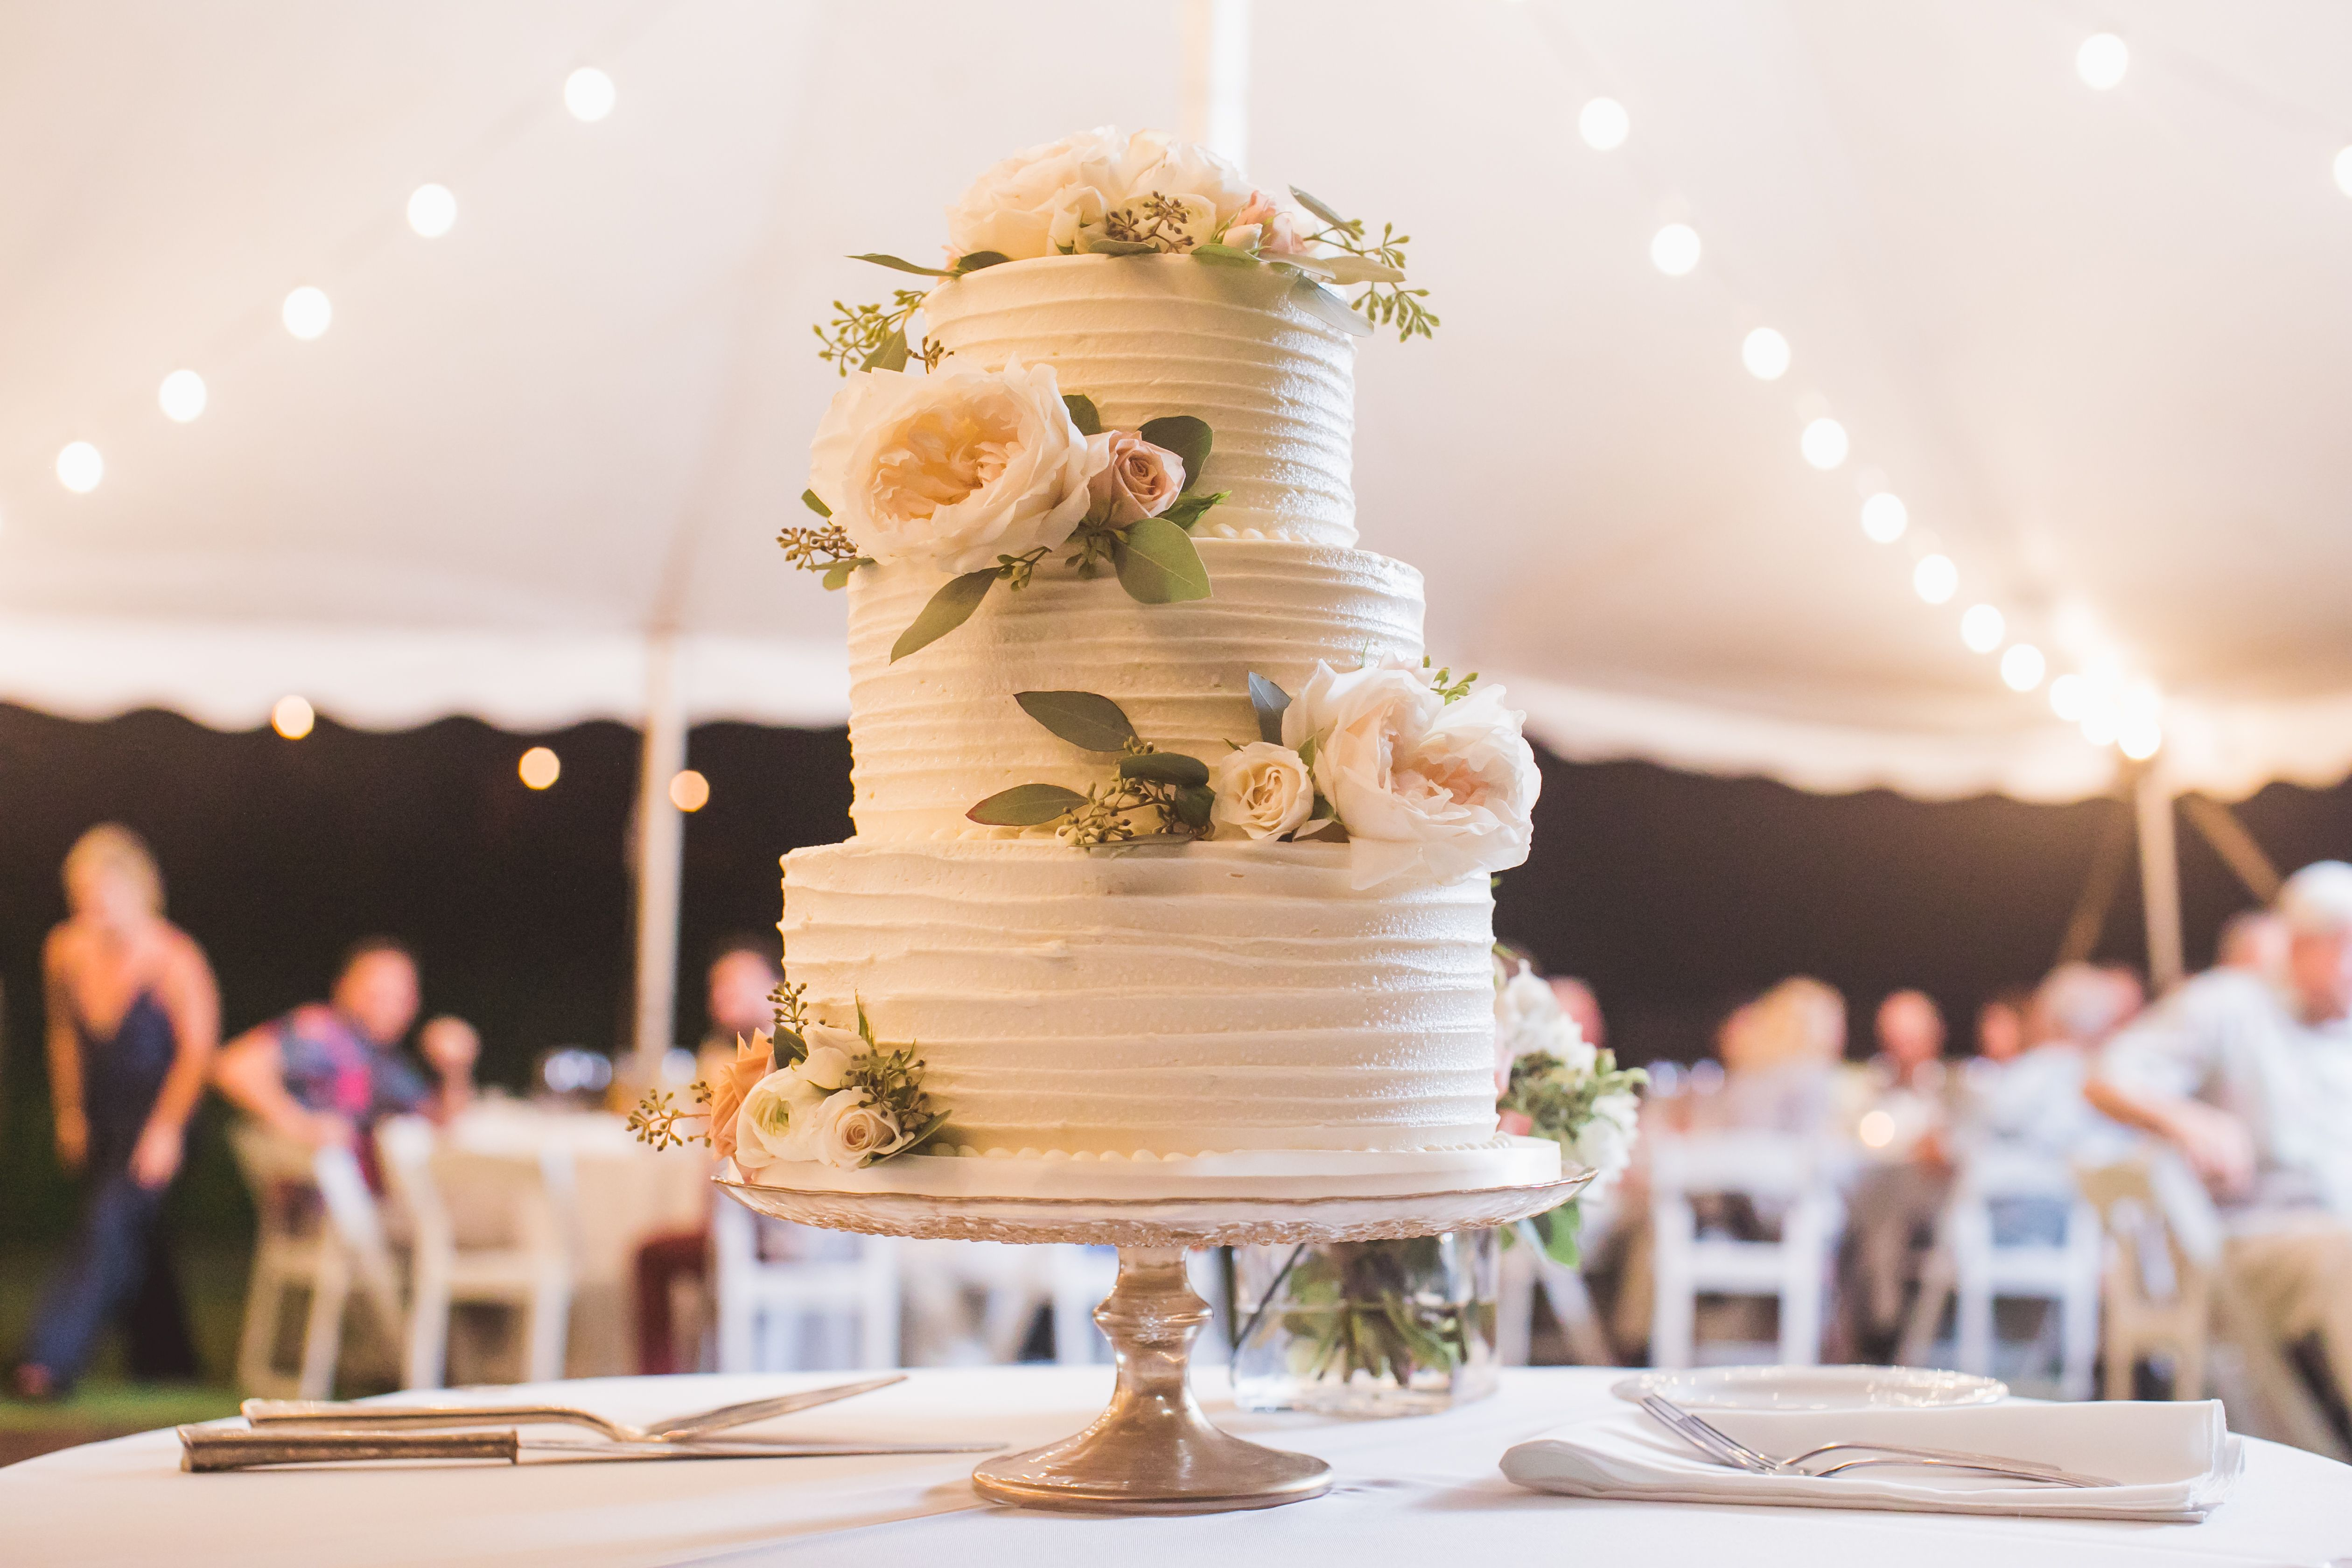 3 Tier Buttercream Wedding Cake Gold cake stand